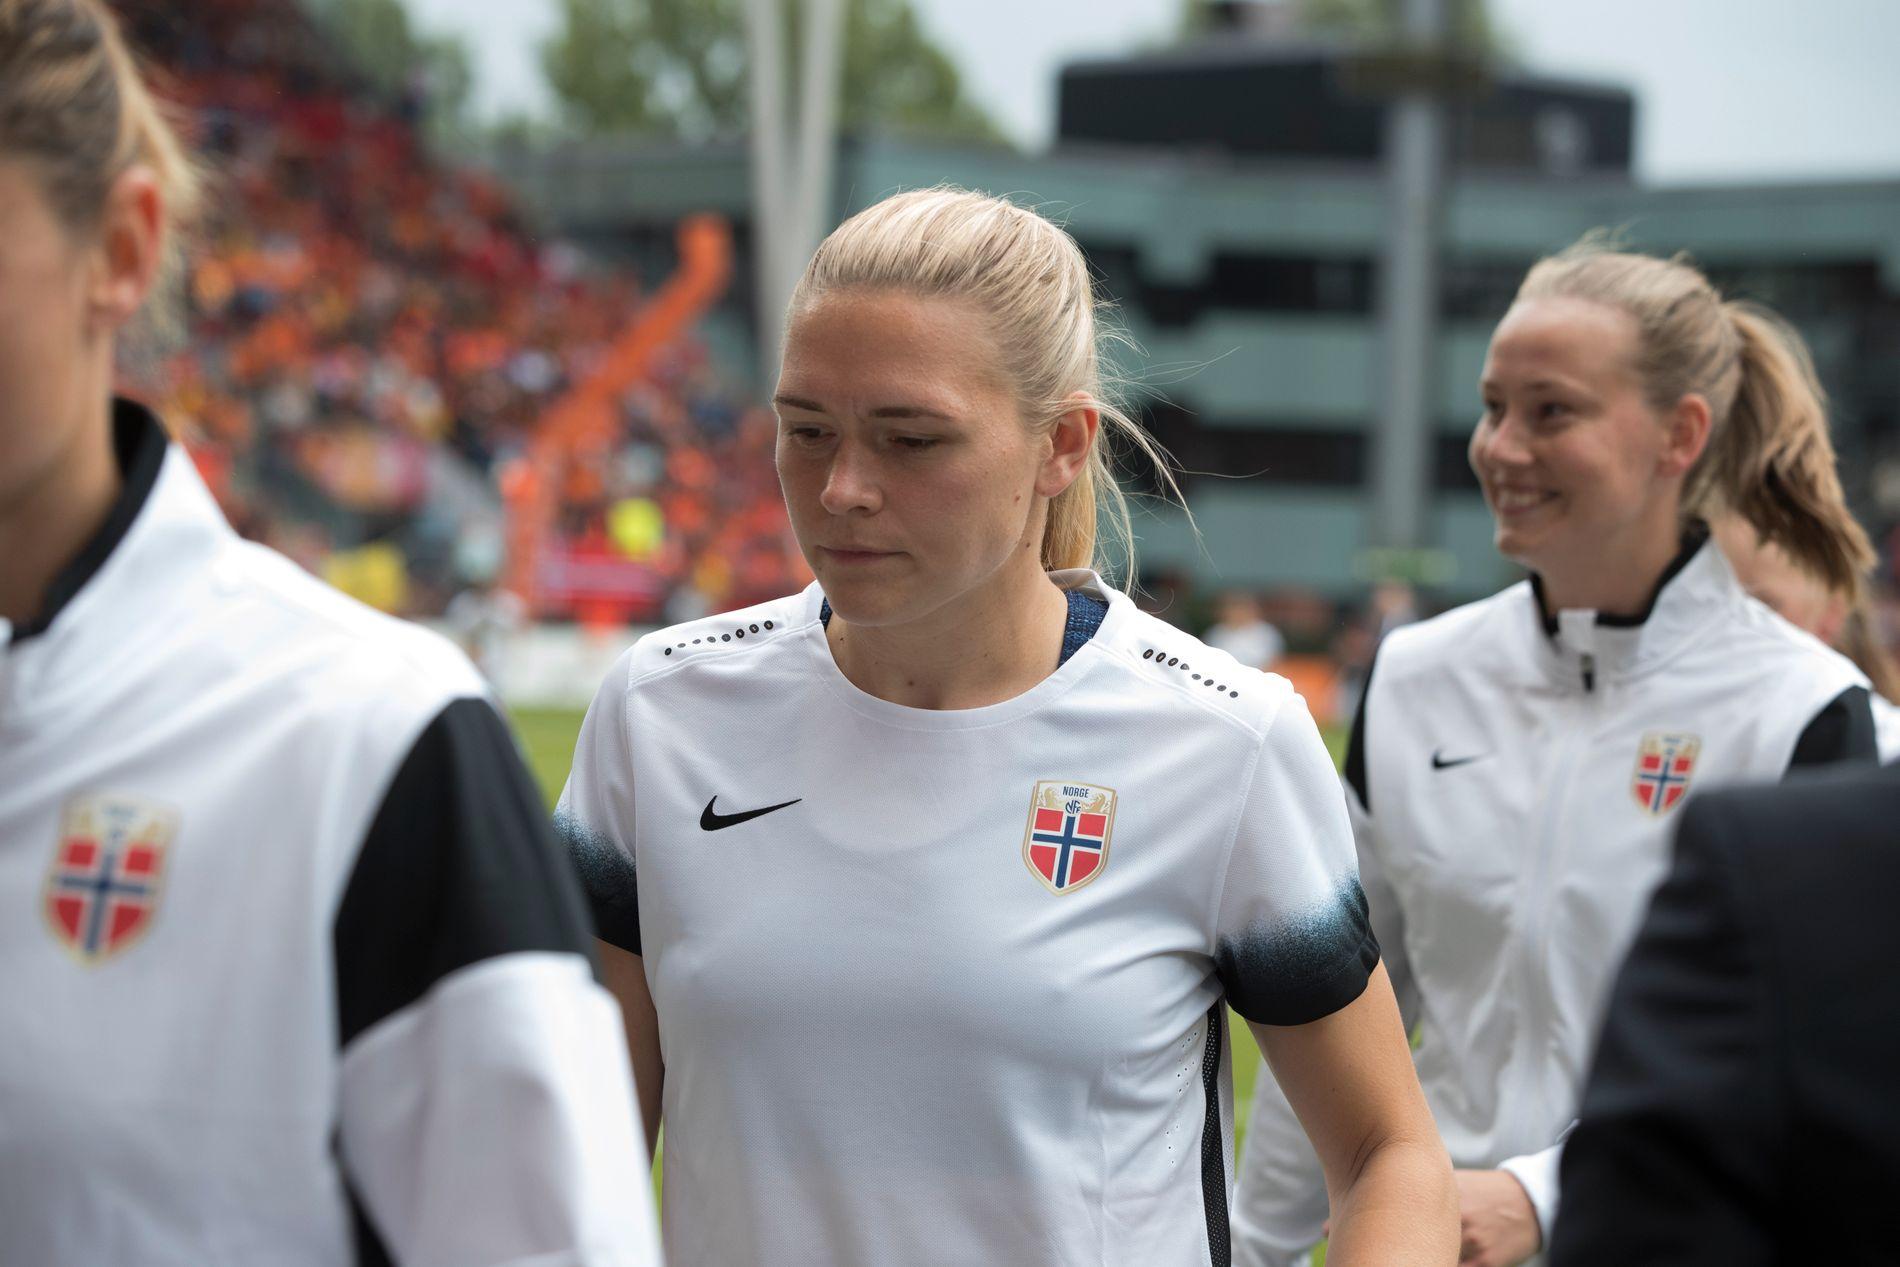 HJEMME IGJEN: Ingrid Isaksen i den norske landslagstrøyen før EM-kampen mot Nederland i 2017. Det kan gå lang tid før neste gang hun spiller med flagget drakten.